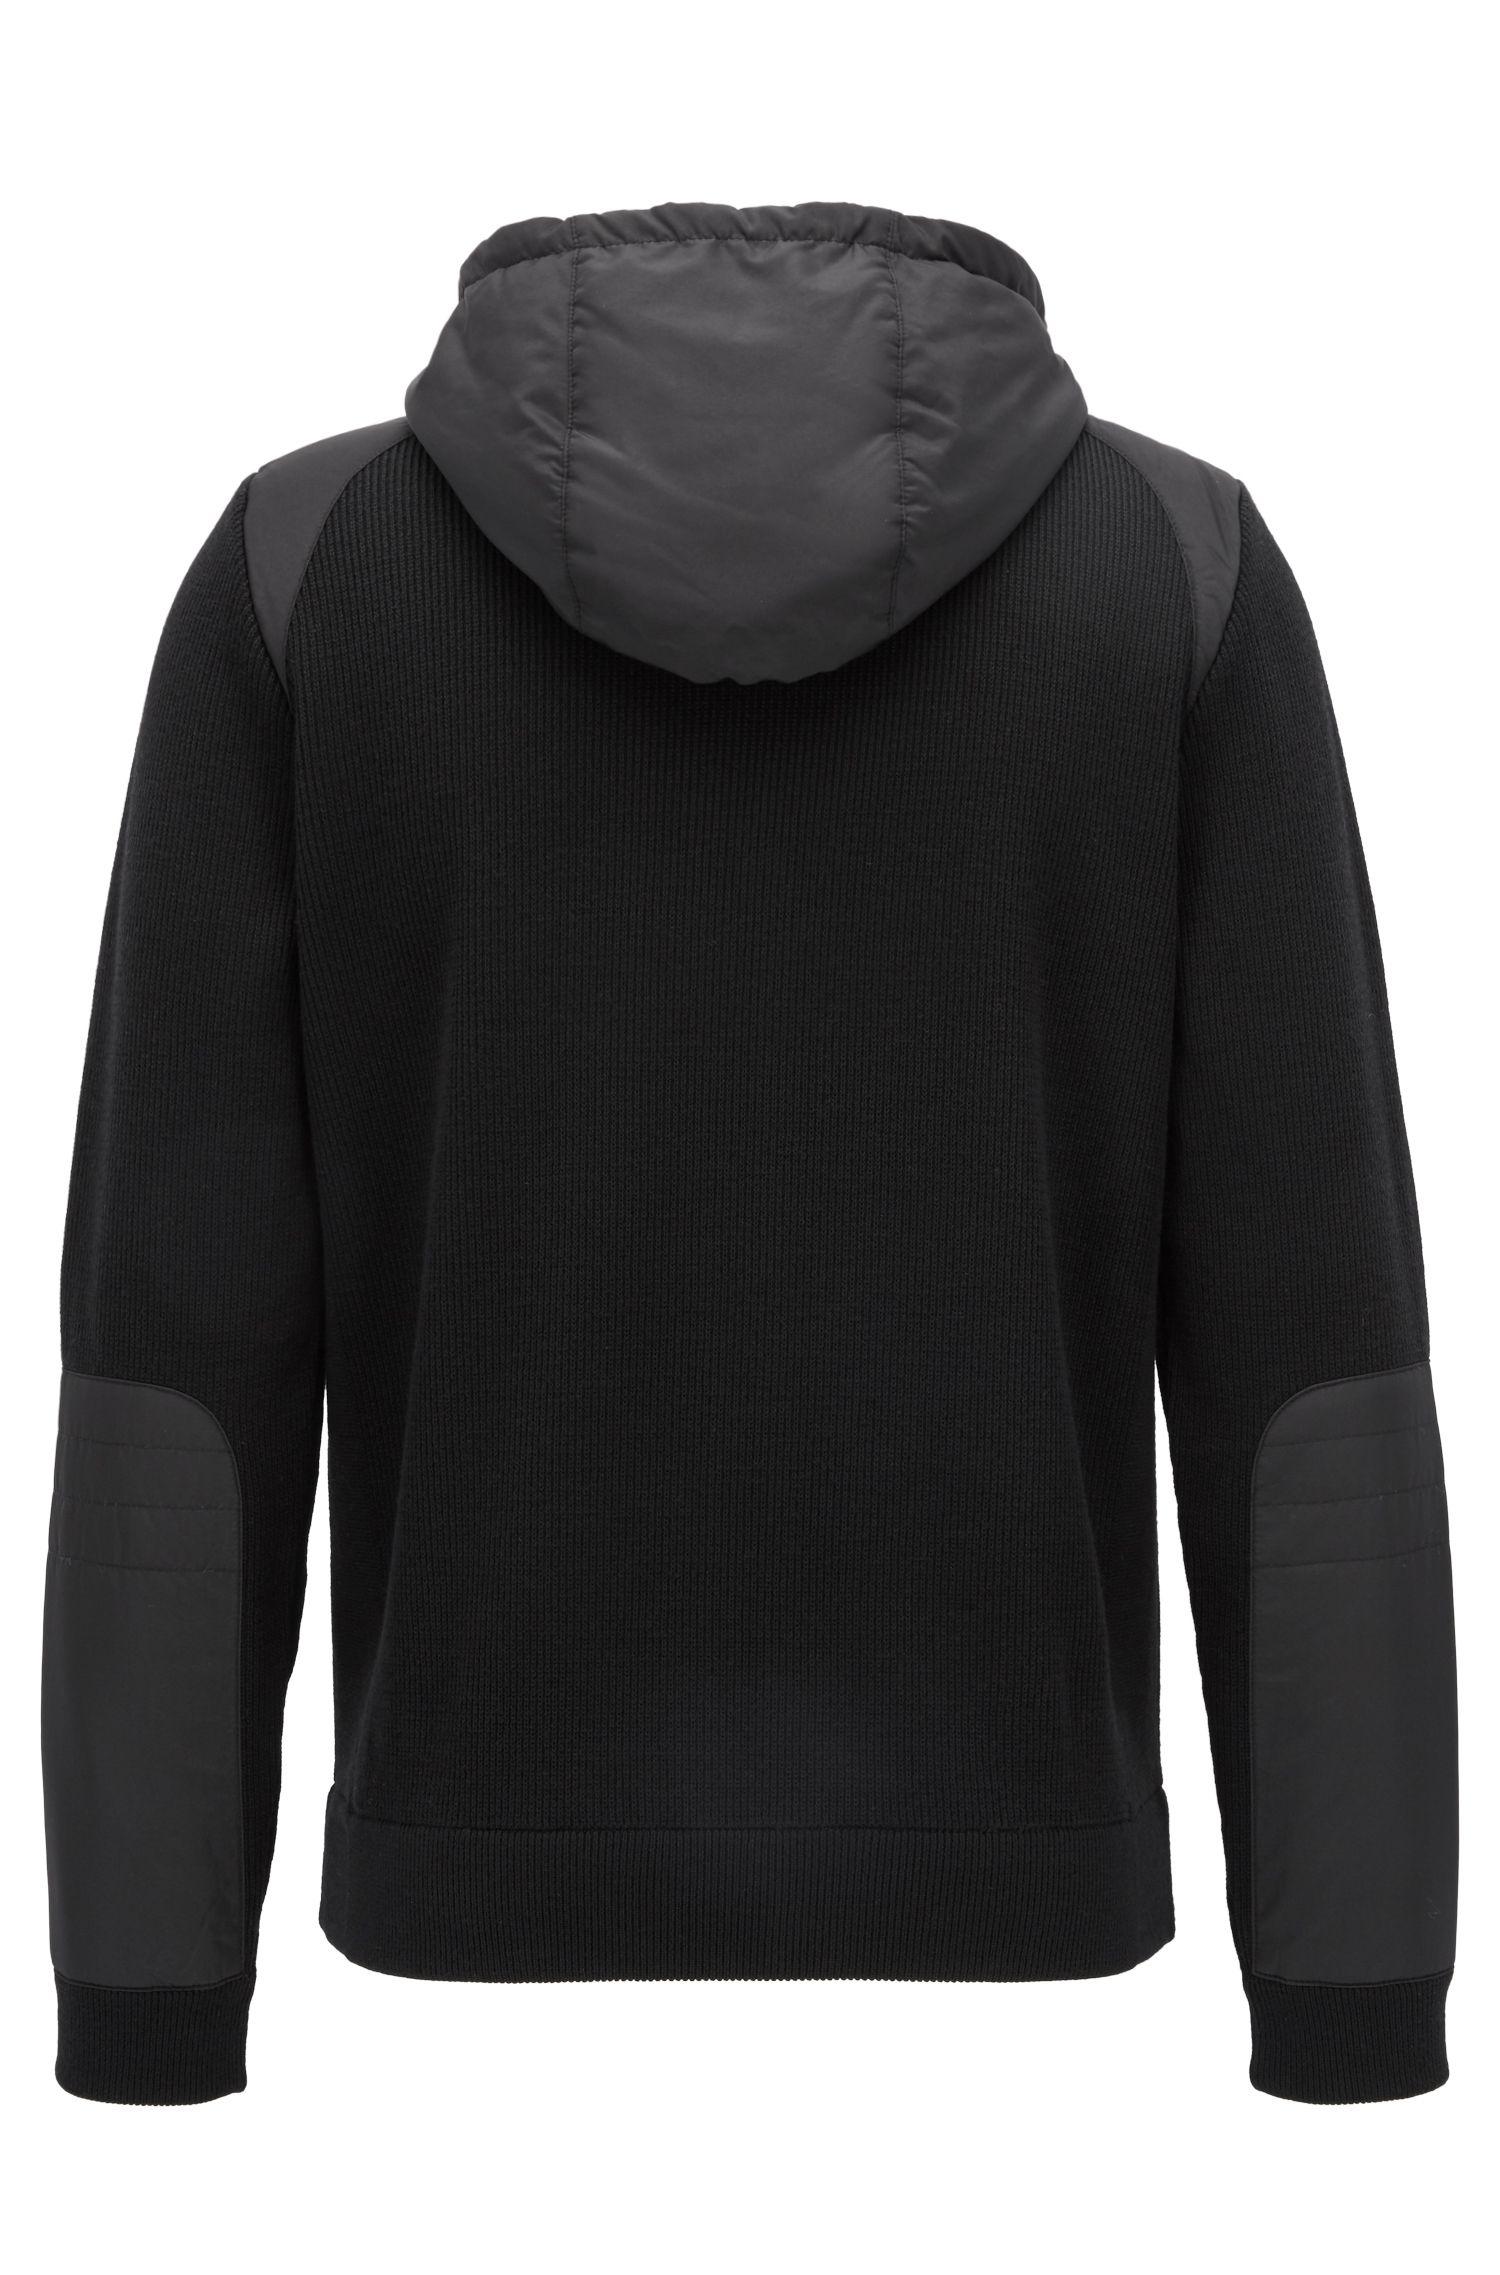 Italian Extra-Fine Merino Wool Full-Zip Jacket, Regular Fit   Daiton